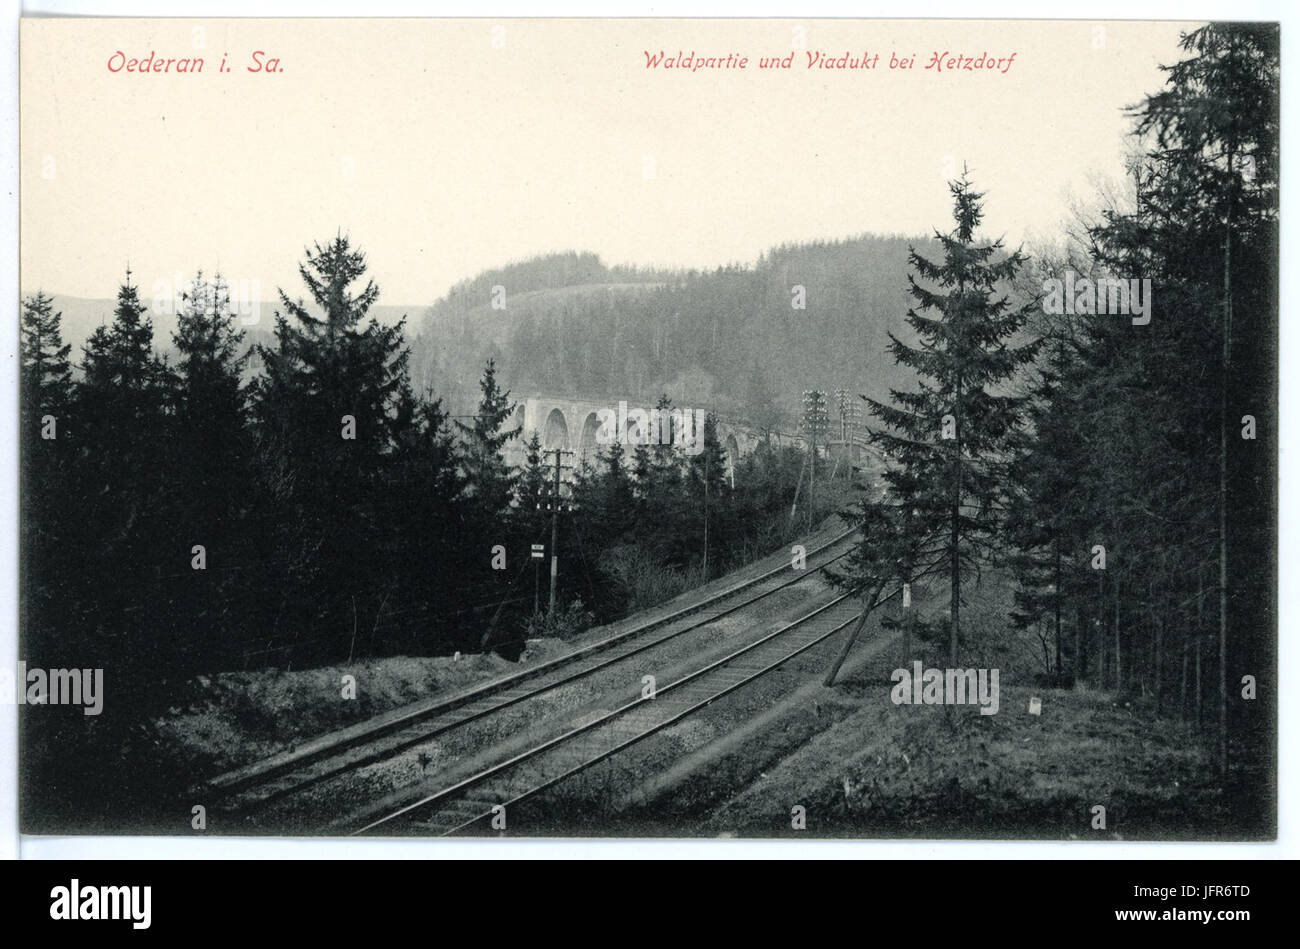 15621-Oederan-1913-Viadukt Bei Hetzdorf-Brück & Sohn Kunstverlag Stockbild